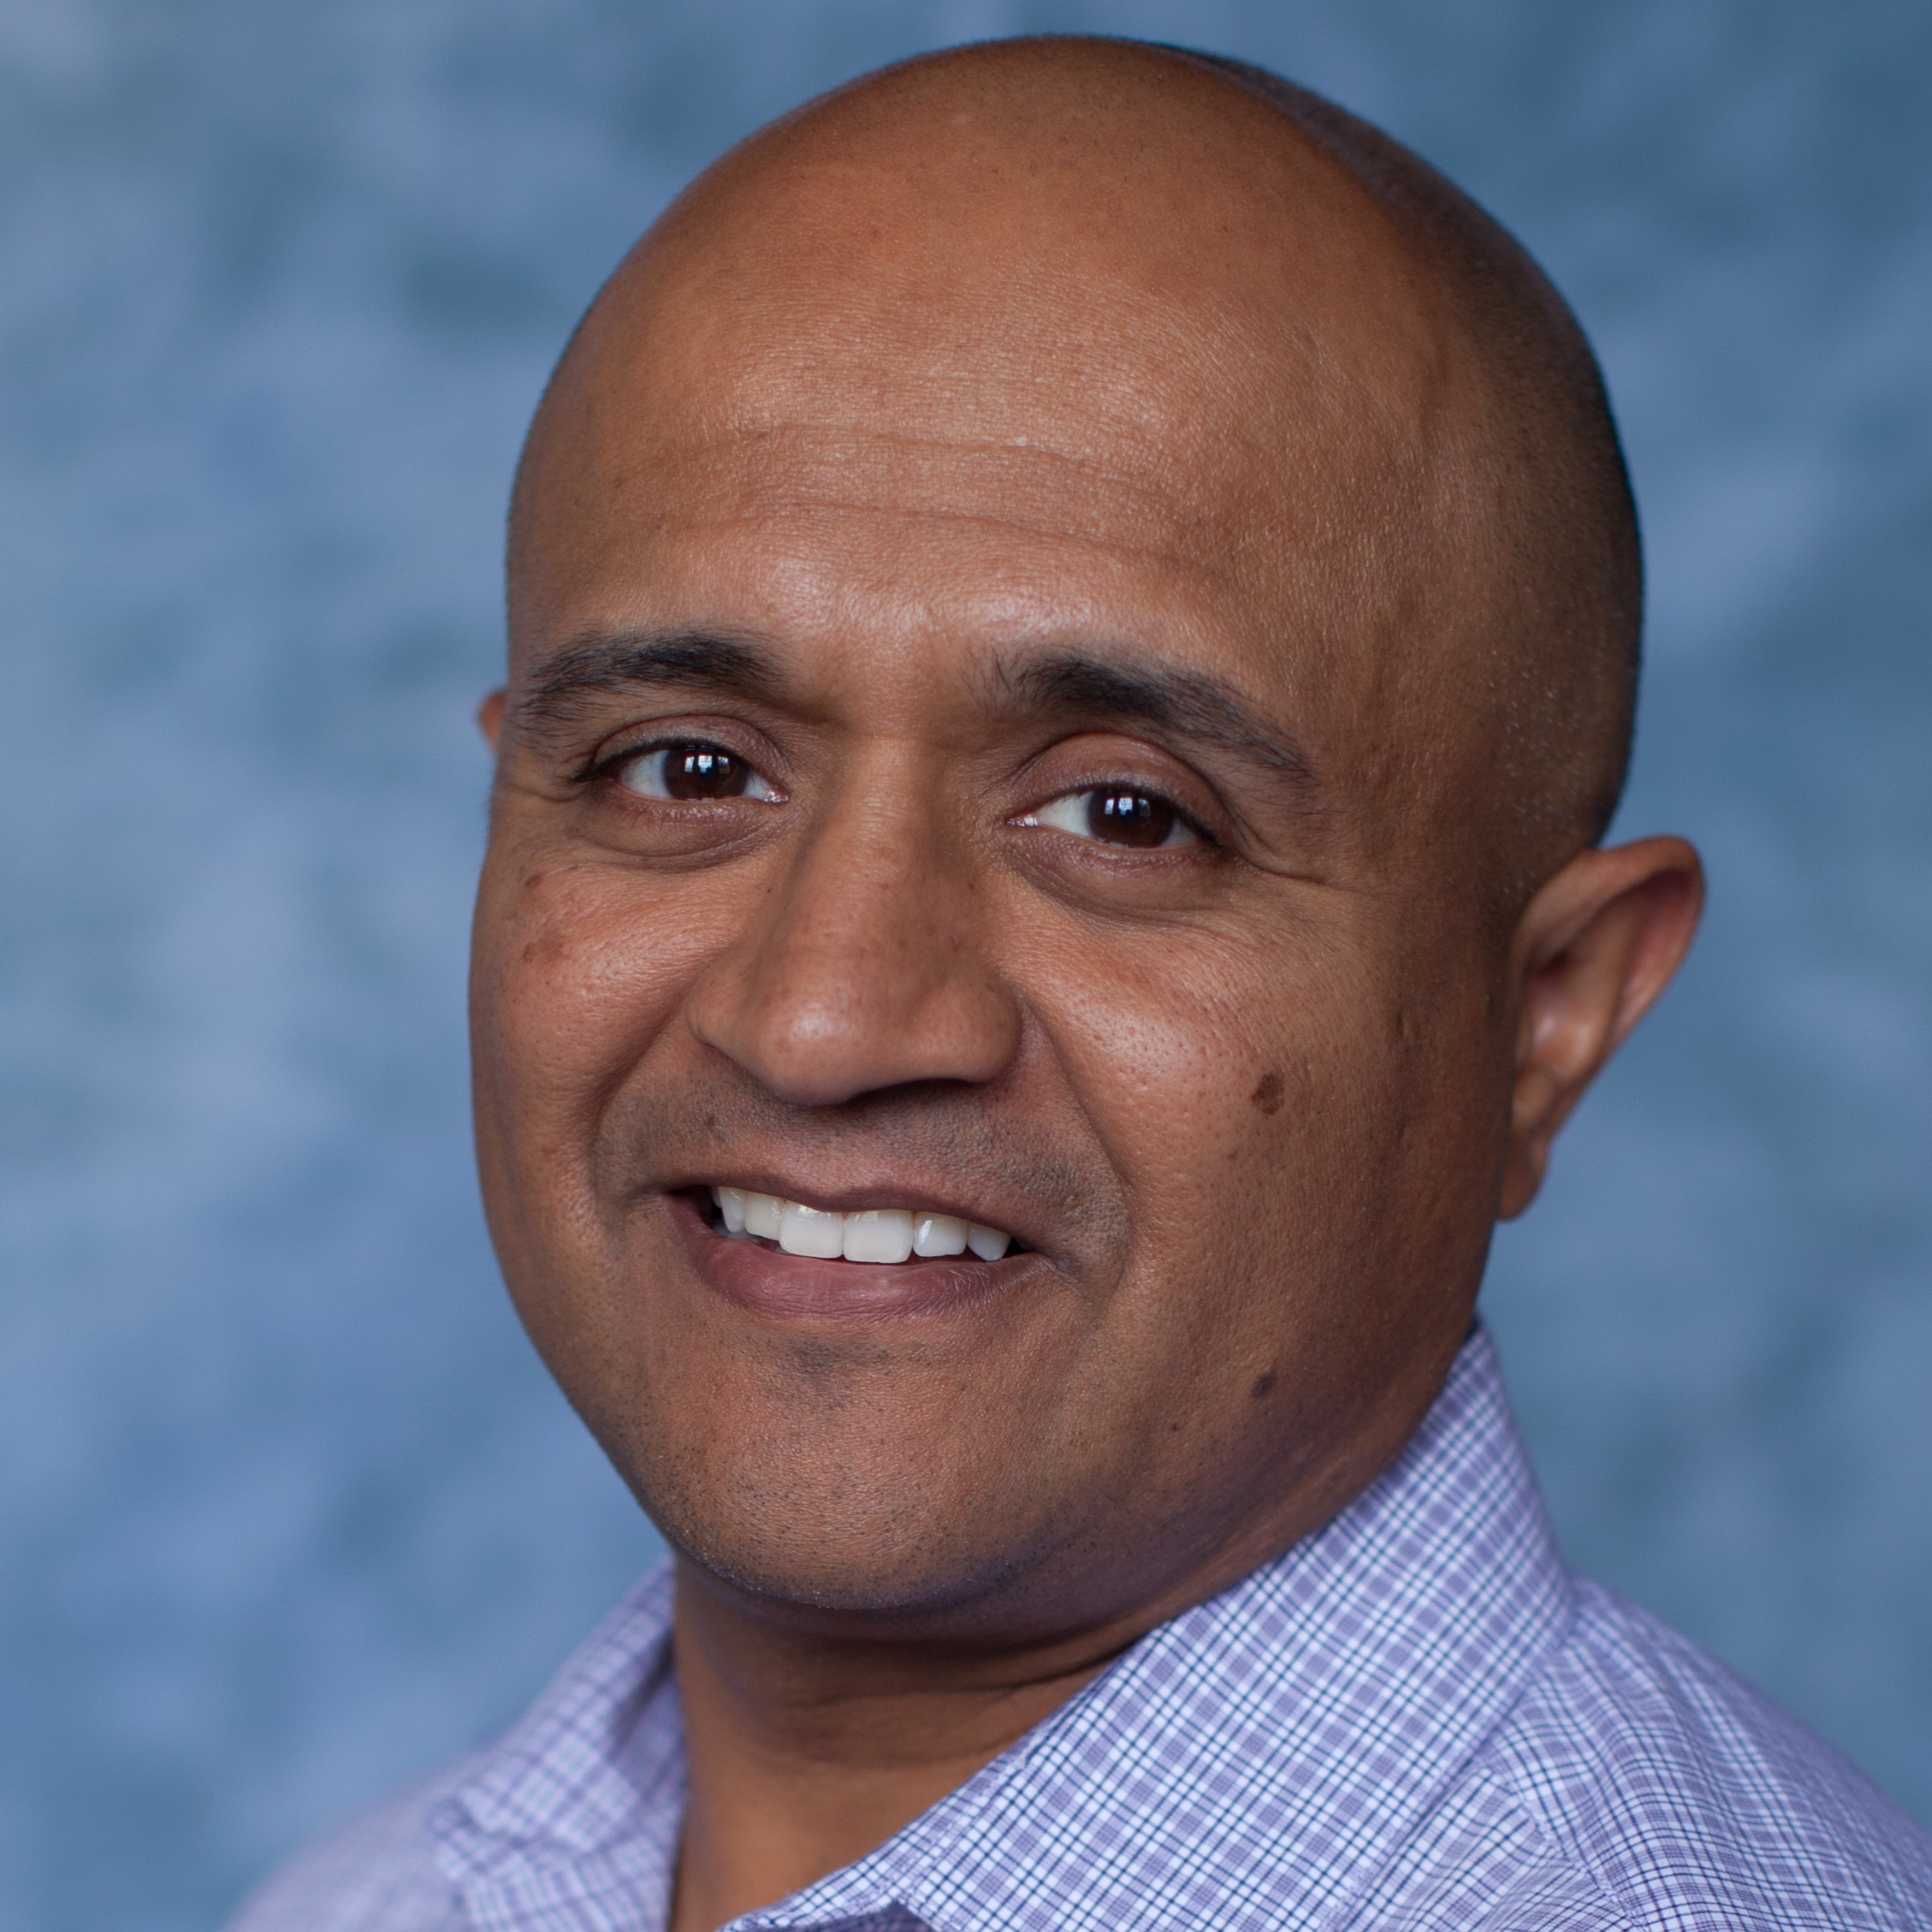 Dr. Sidharth Bansal